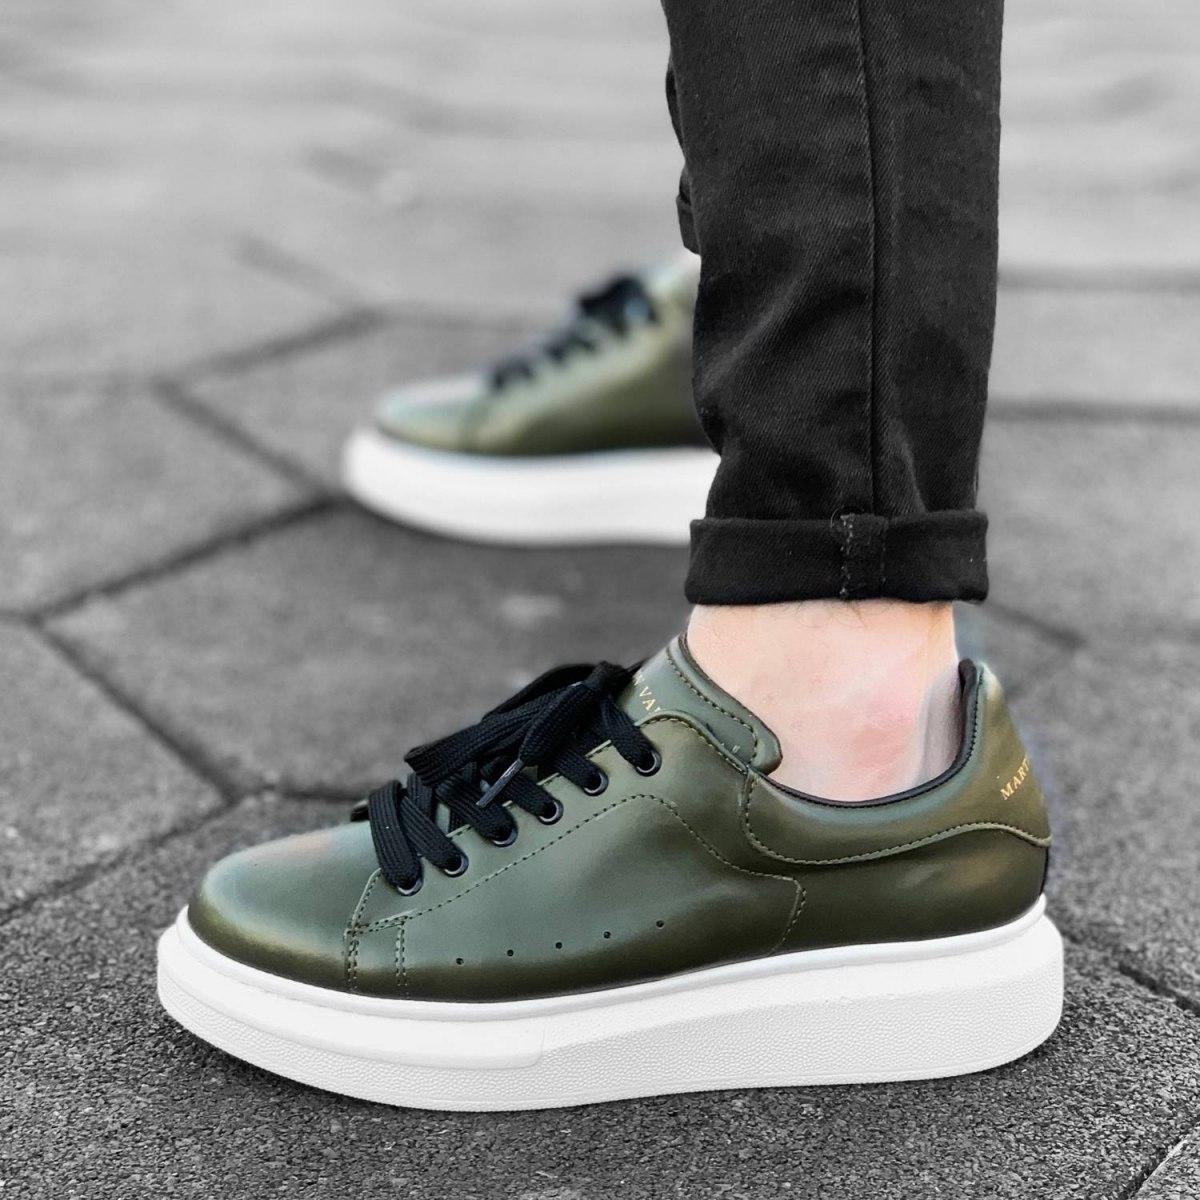 Hype Sole Sneakers in Khaki-White - 4